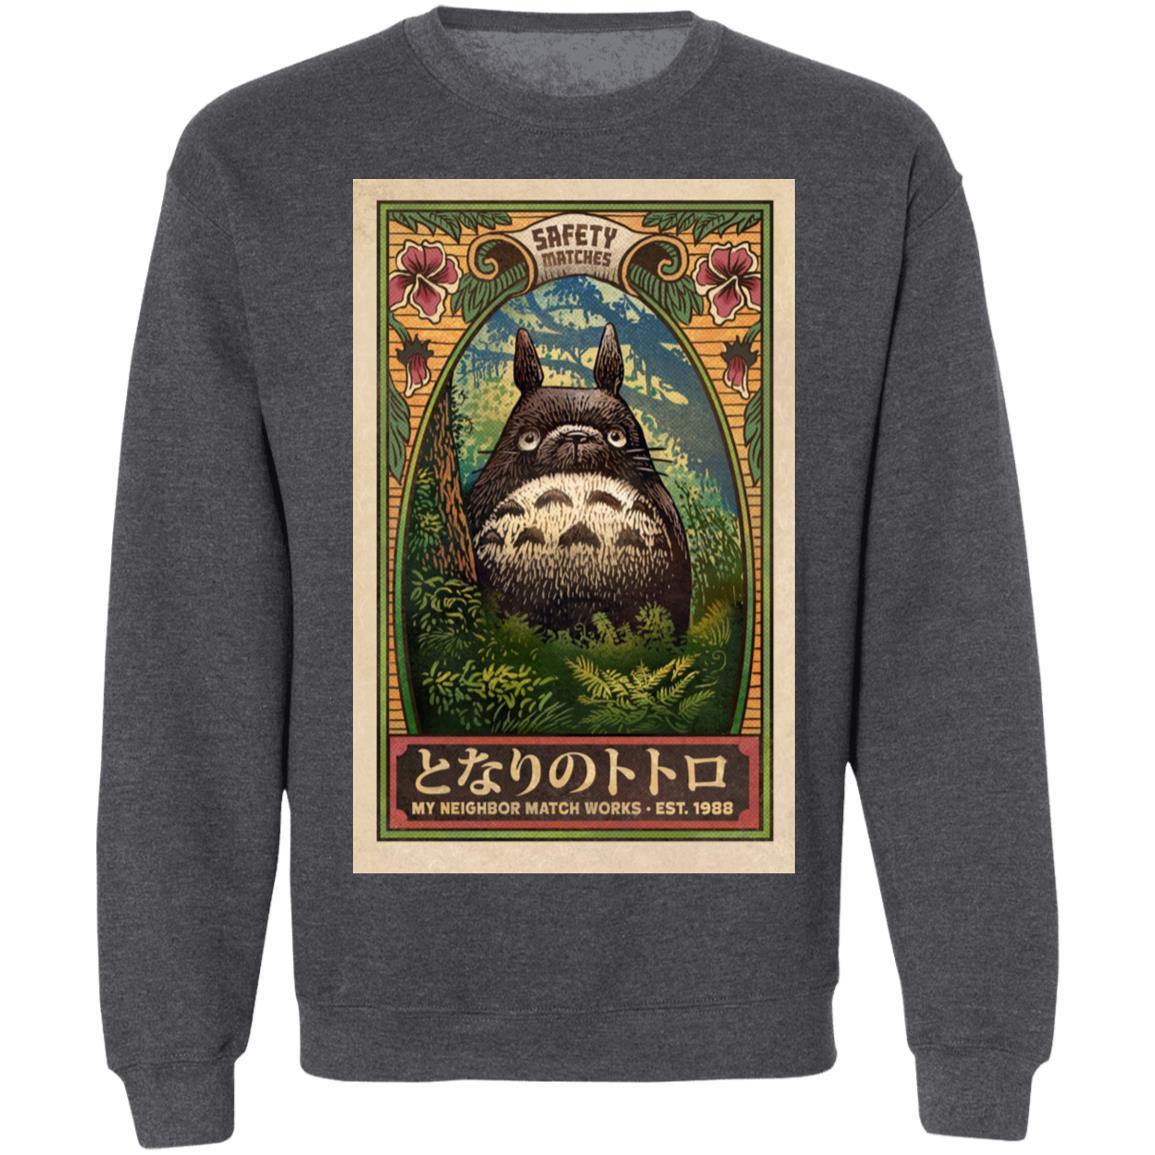 My Neighbor Totoro Safety Matches 1988 Sweatshirt